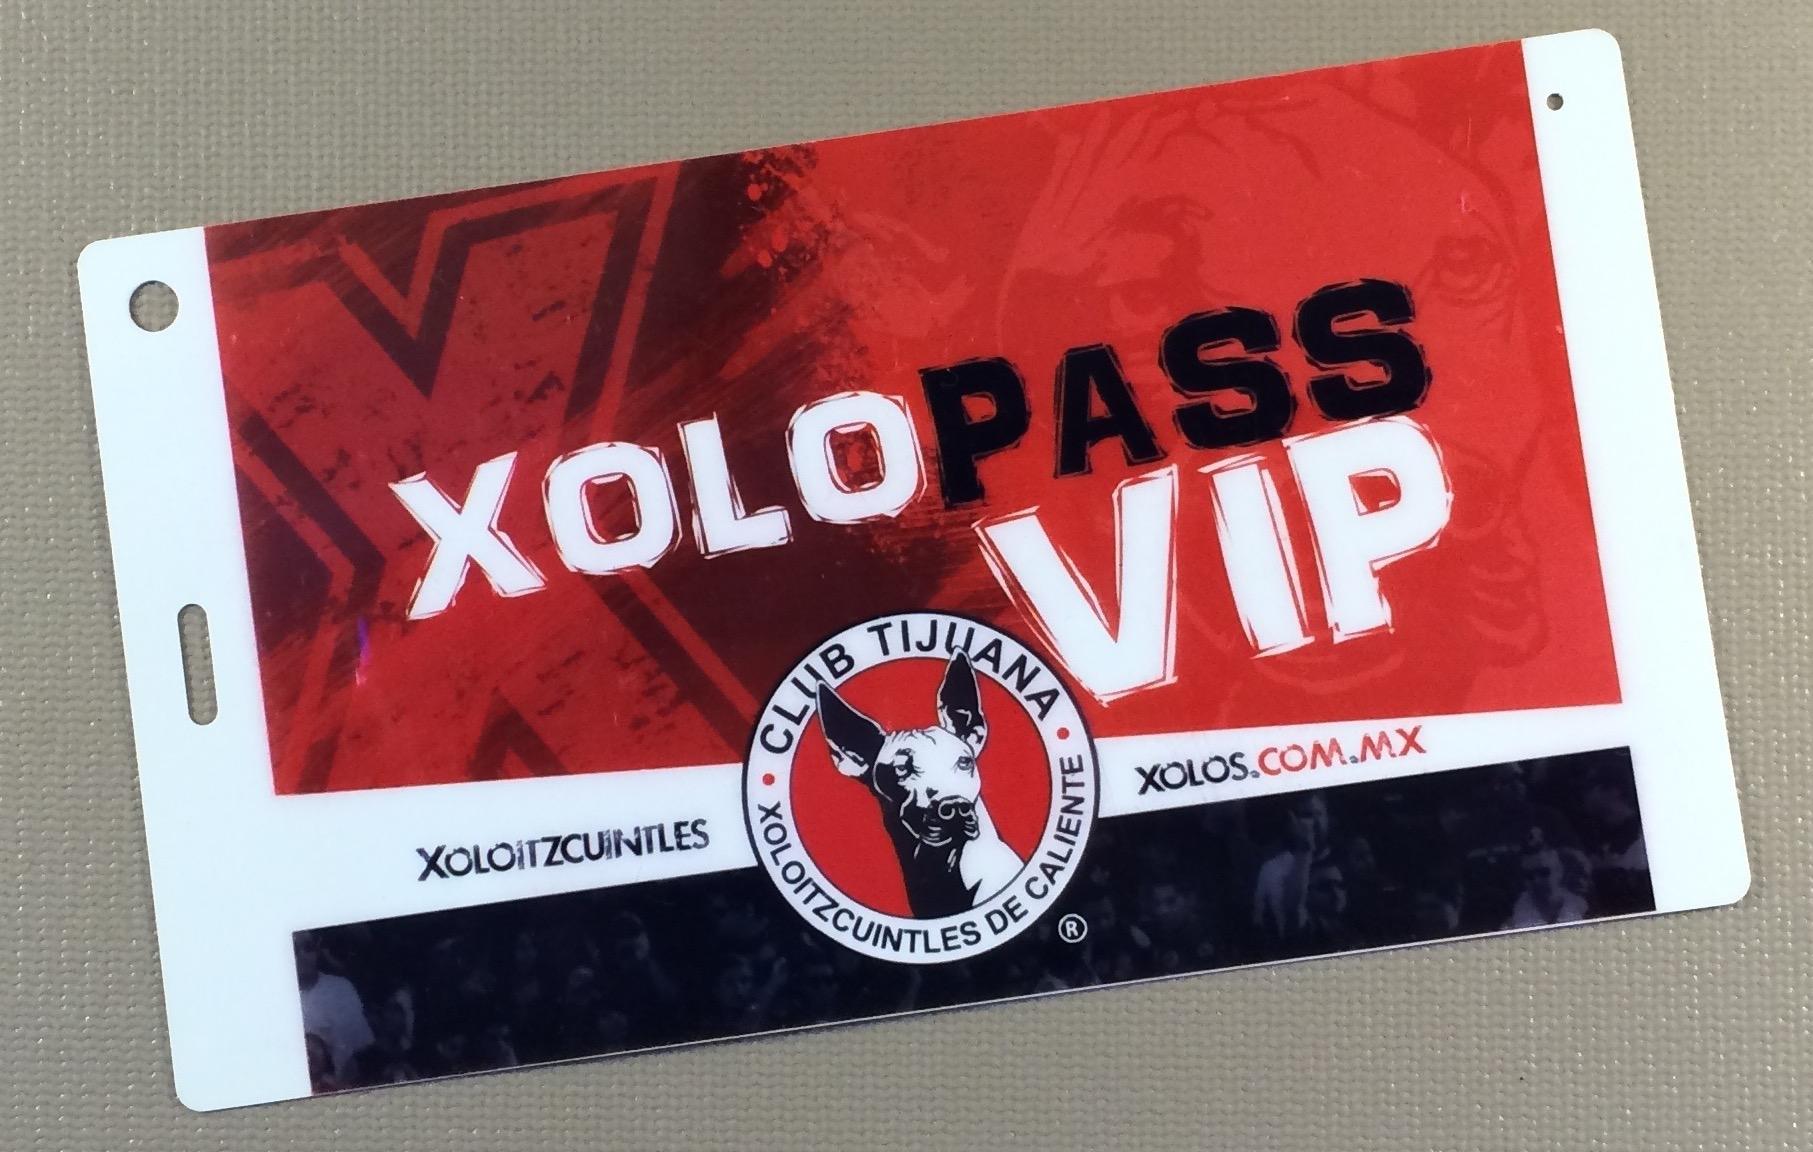 2010 Clausura XoloPass